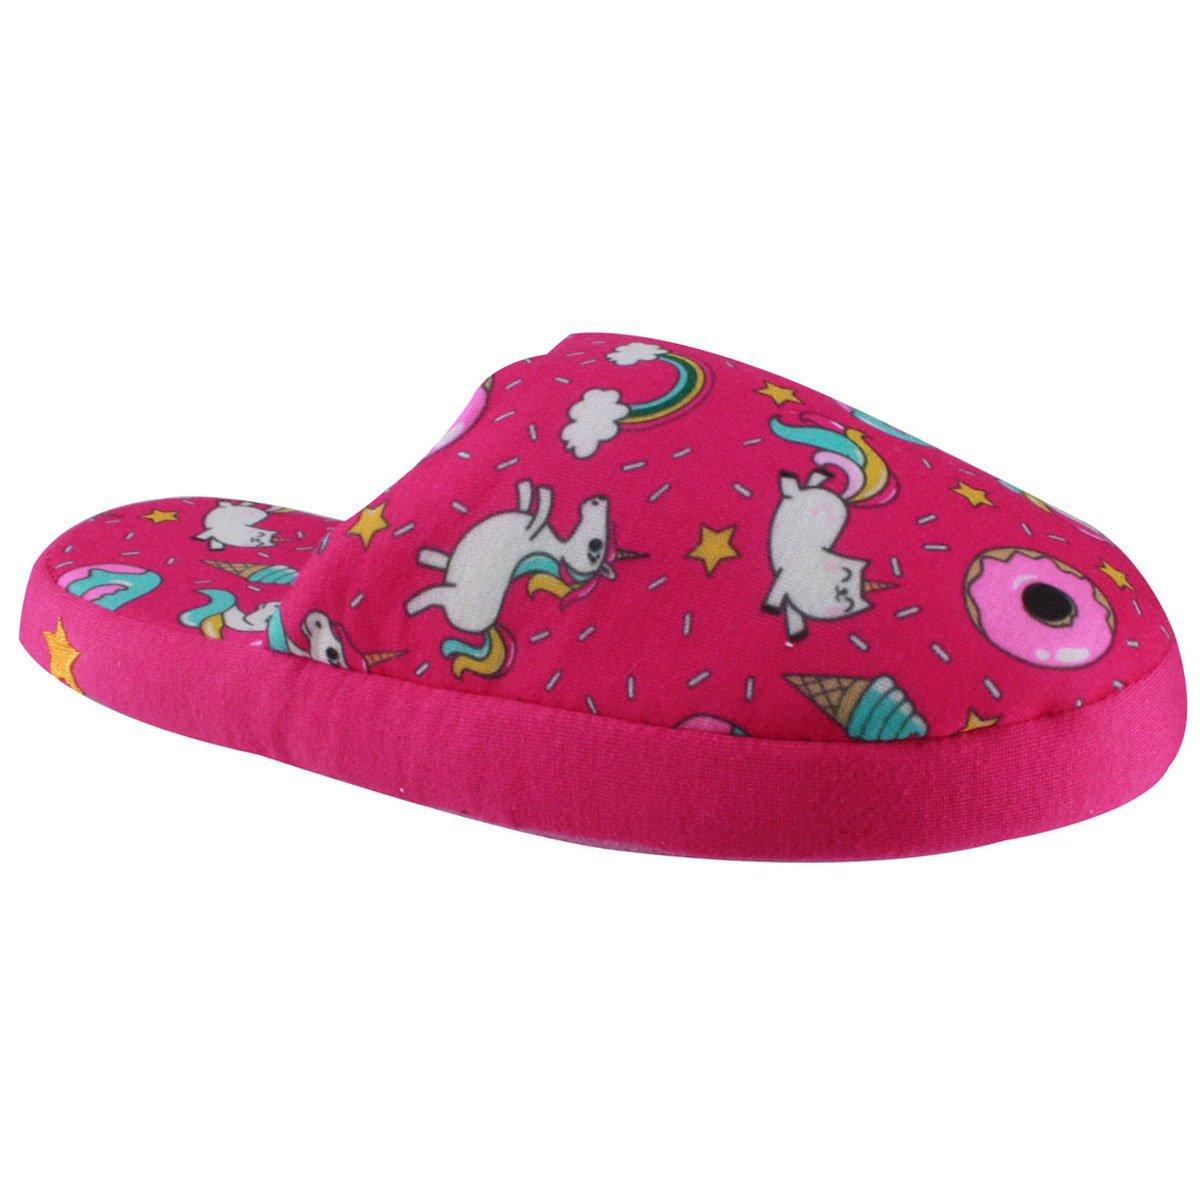 f57c37a6d Chinelo de Inverno Ricsen Unicornio Donuts 13646 - Rosa - Calçados ...